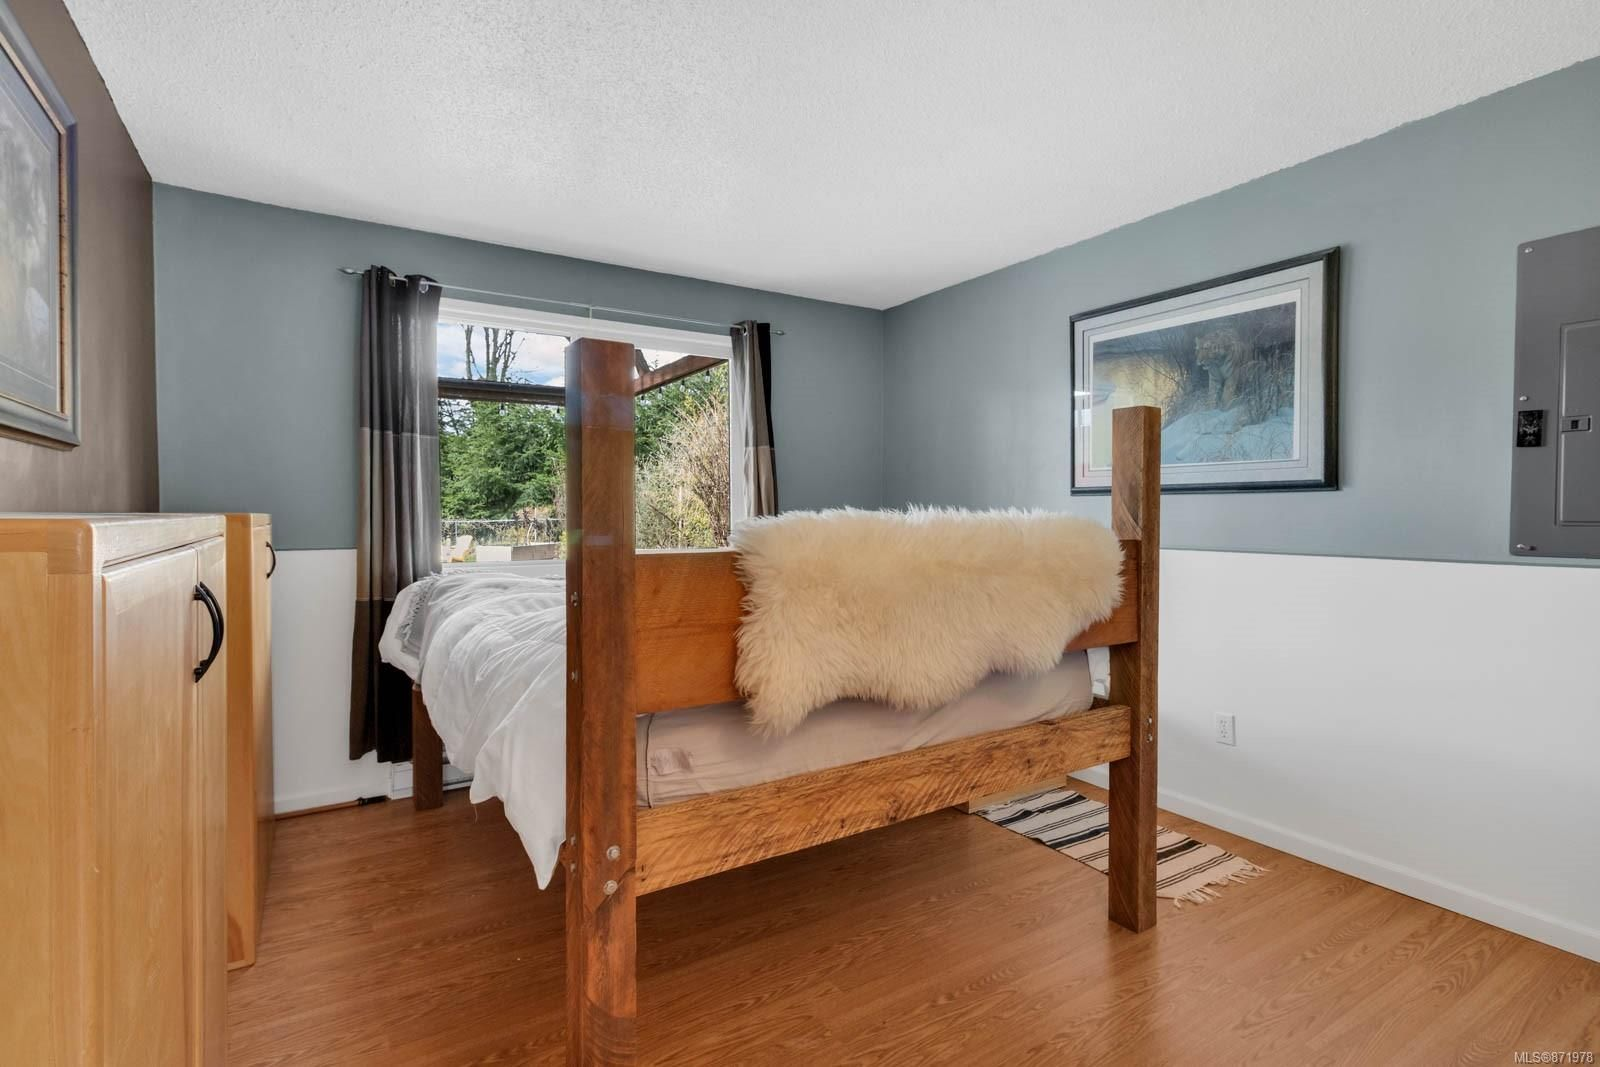 Photo 14: Photos: 1539 Chilcotin Cres in : CV Comox (Town of) House for sale (Comox Valley)  : MLS®# 871978